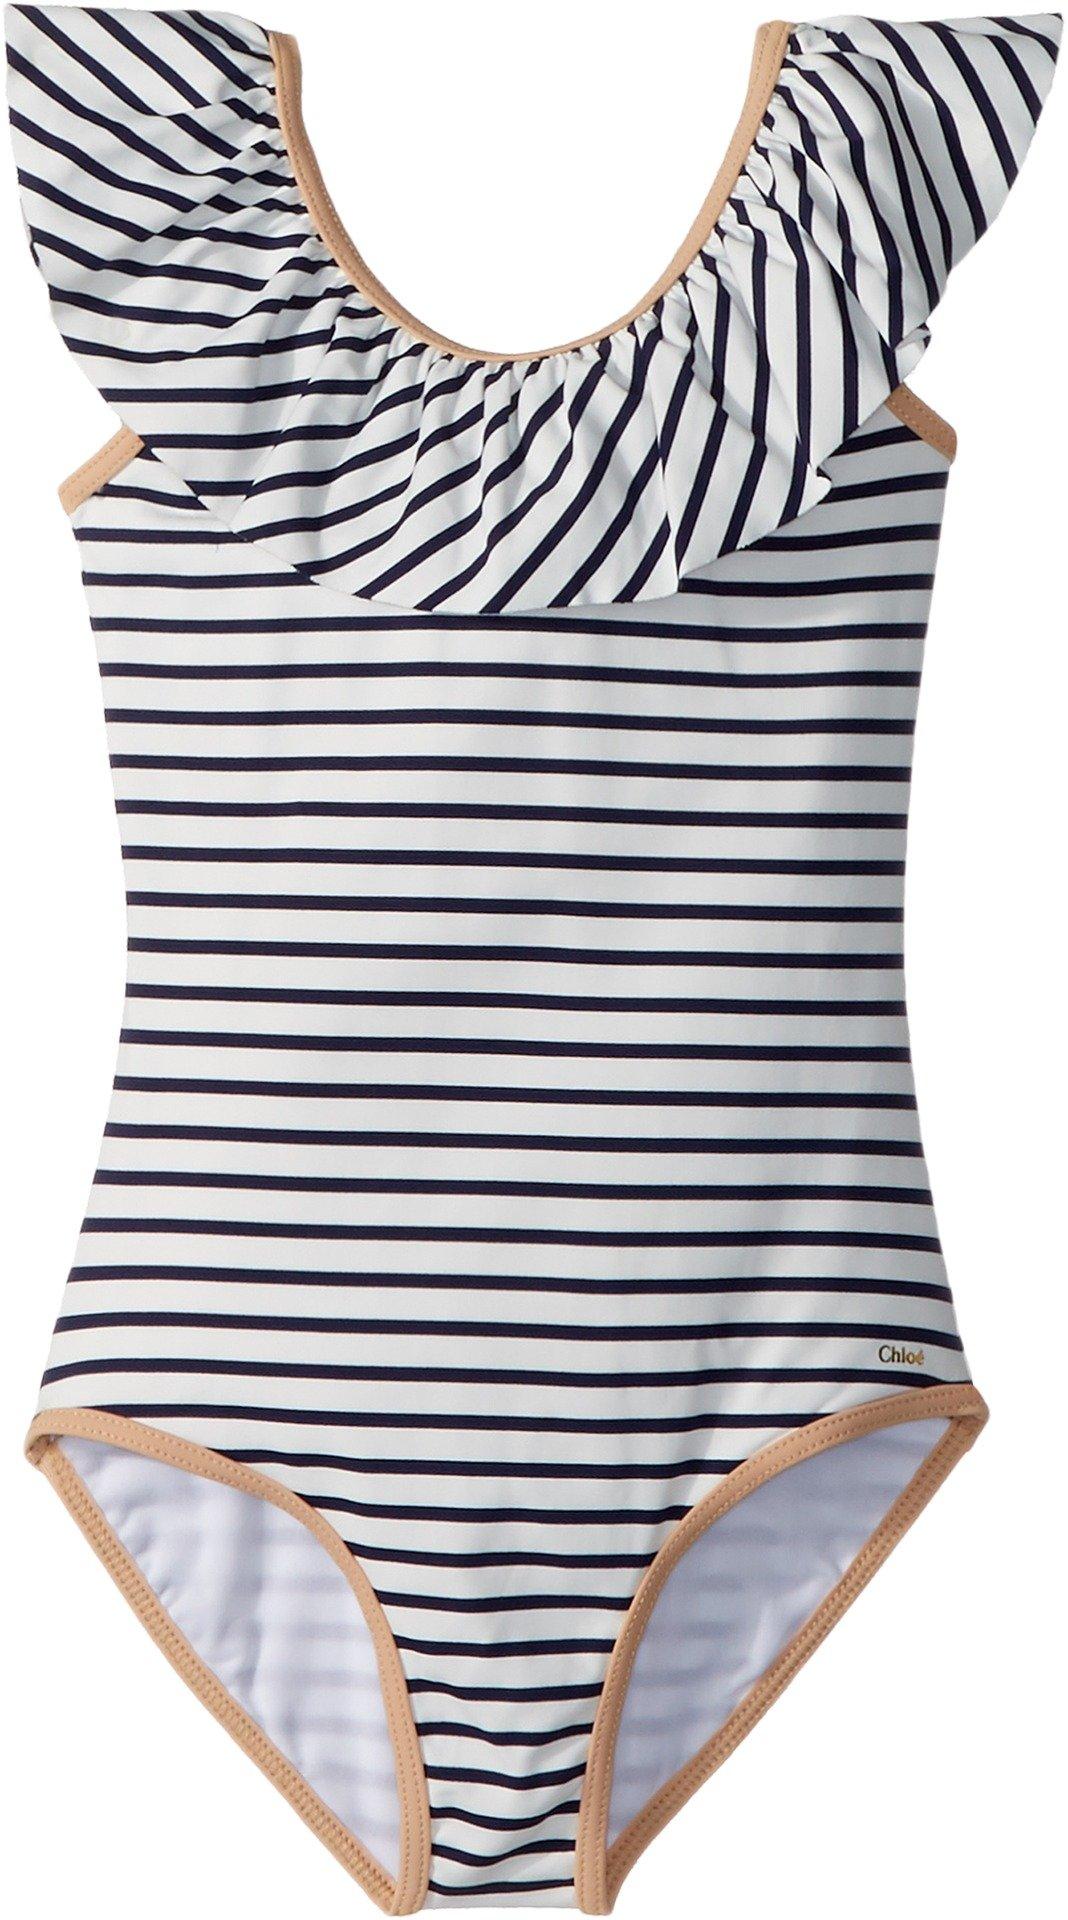 Chloe Kids Girl's Striped One-Piece Swimsuit (Little Kids/Big Kids) Caban 8